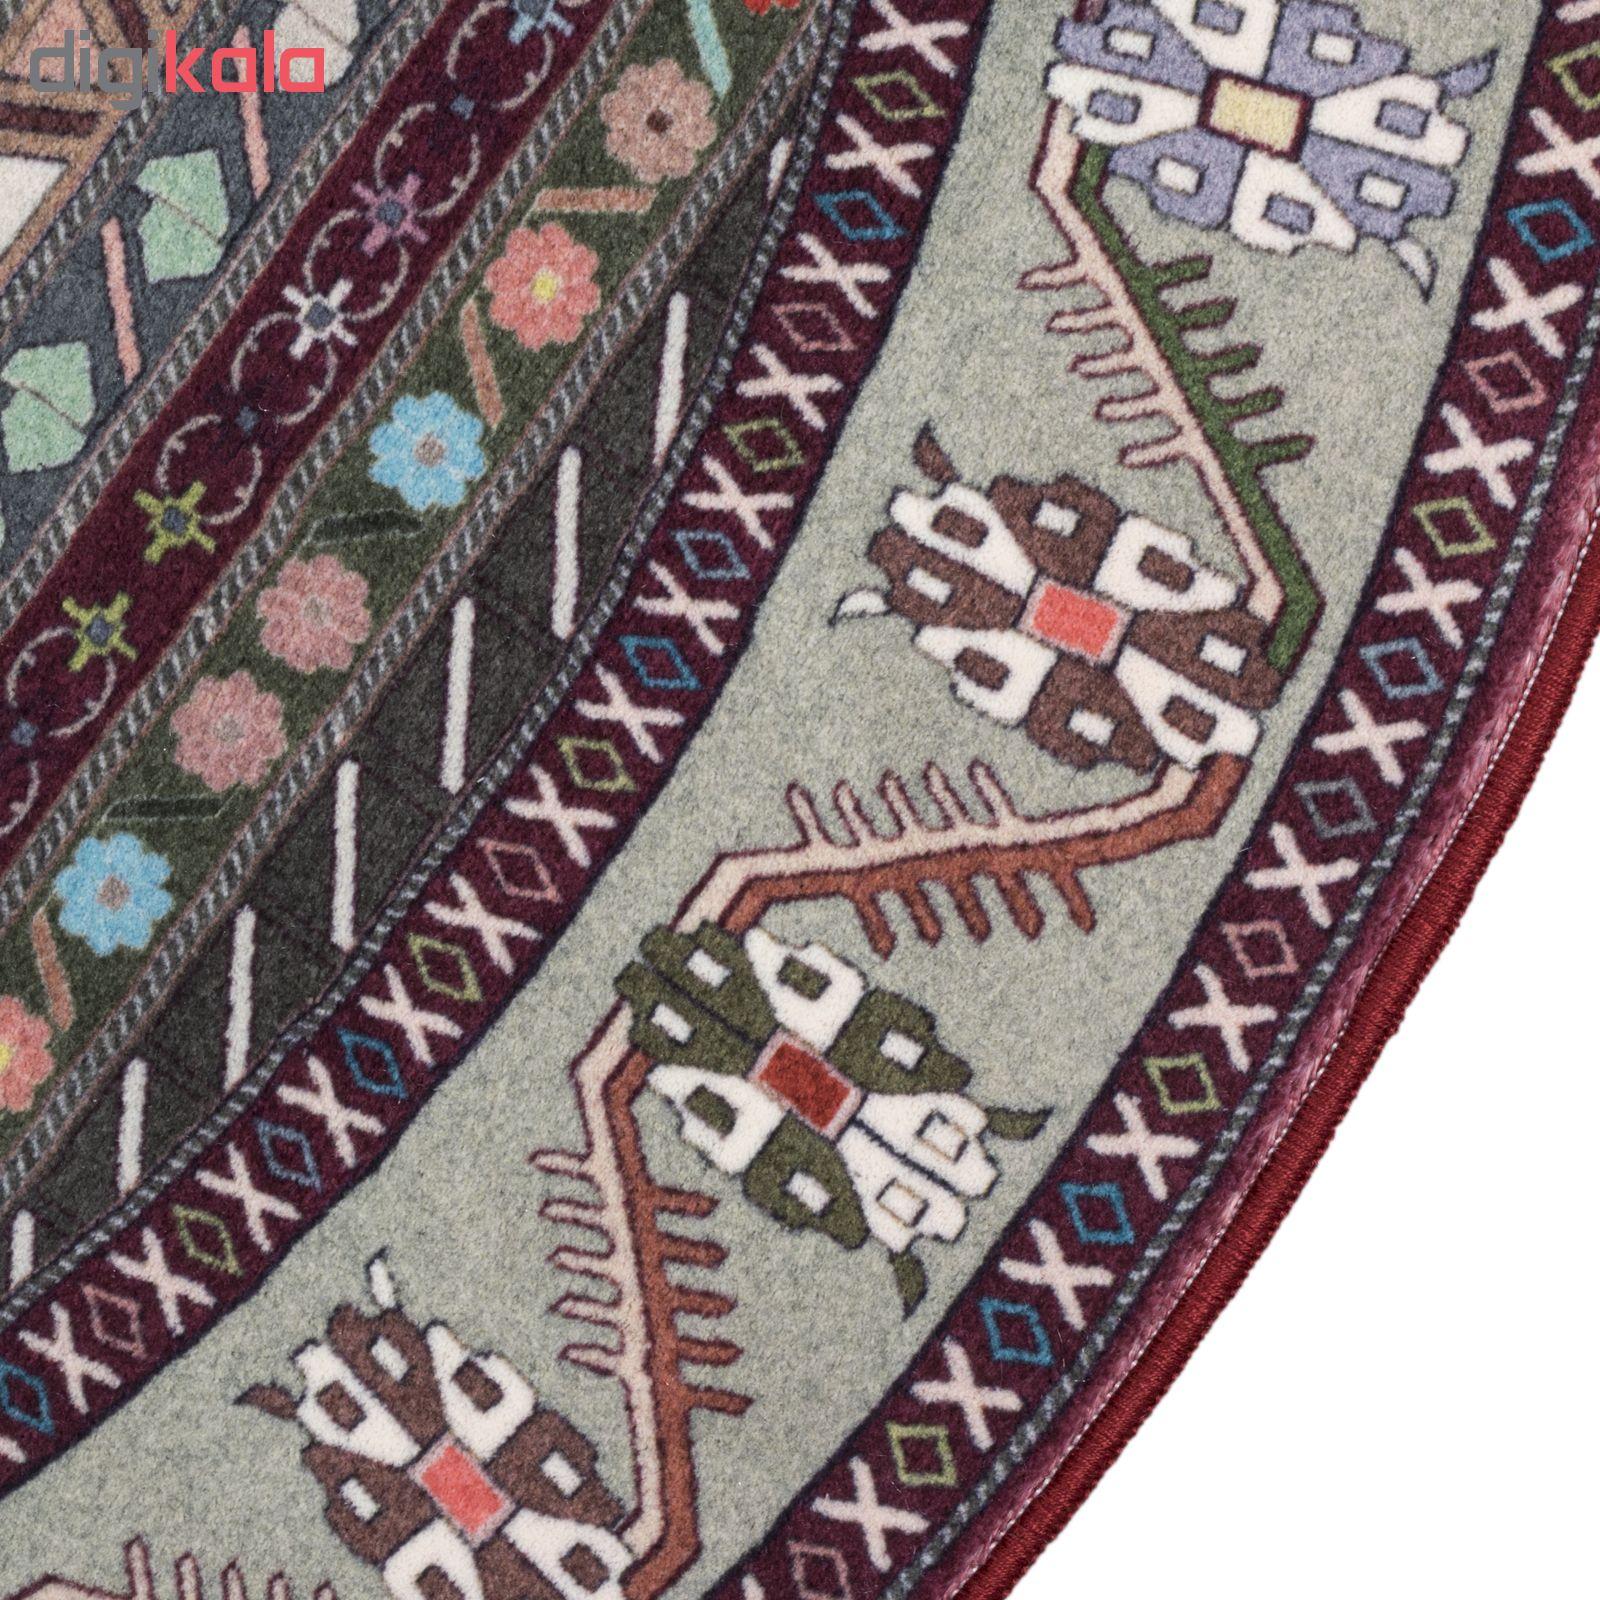 فرش ماشینی محتشم طرح گرد مدل سنتی ترکمن کد 100315 زمینه لاکی